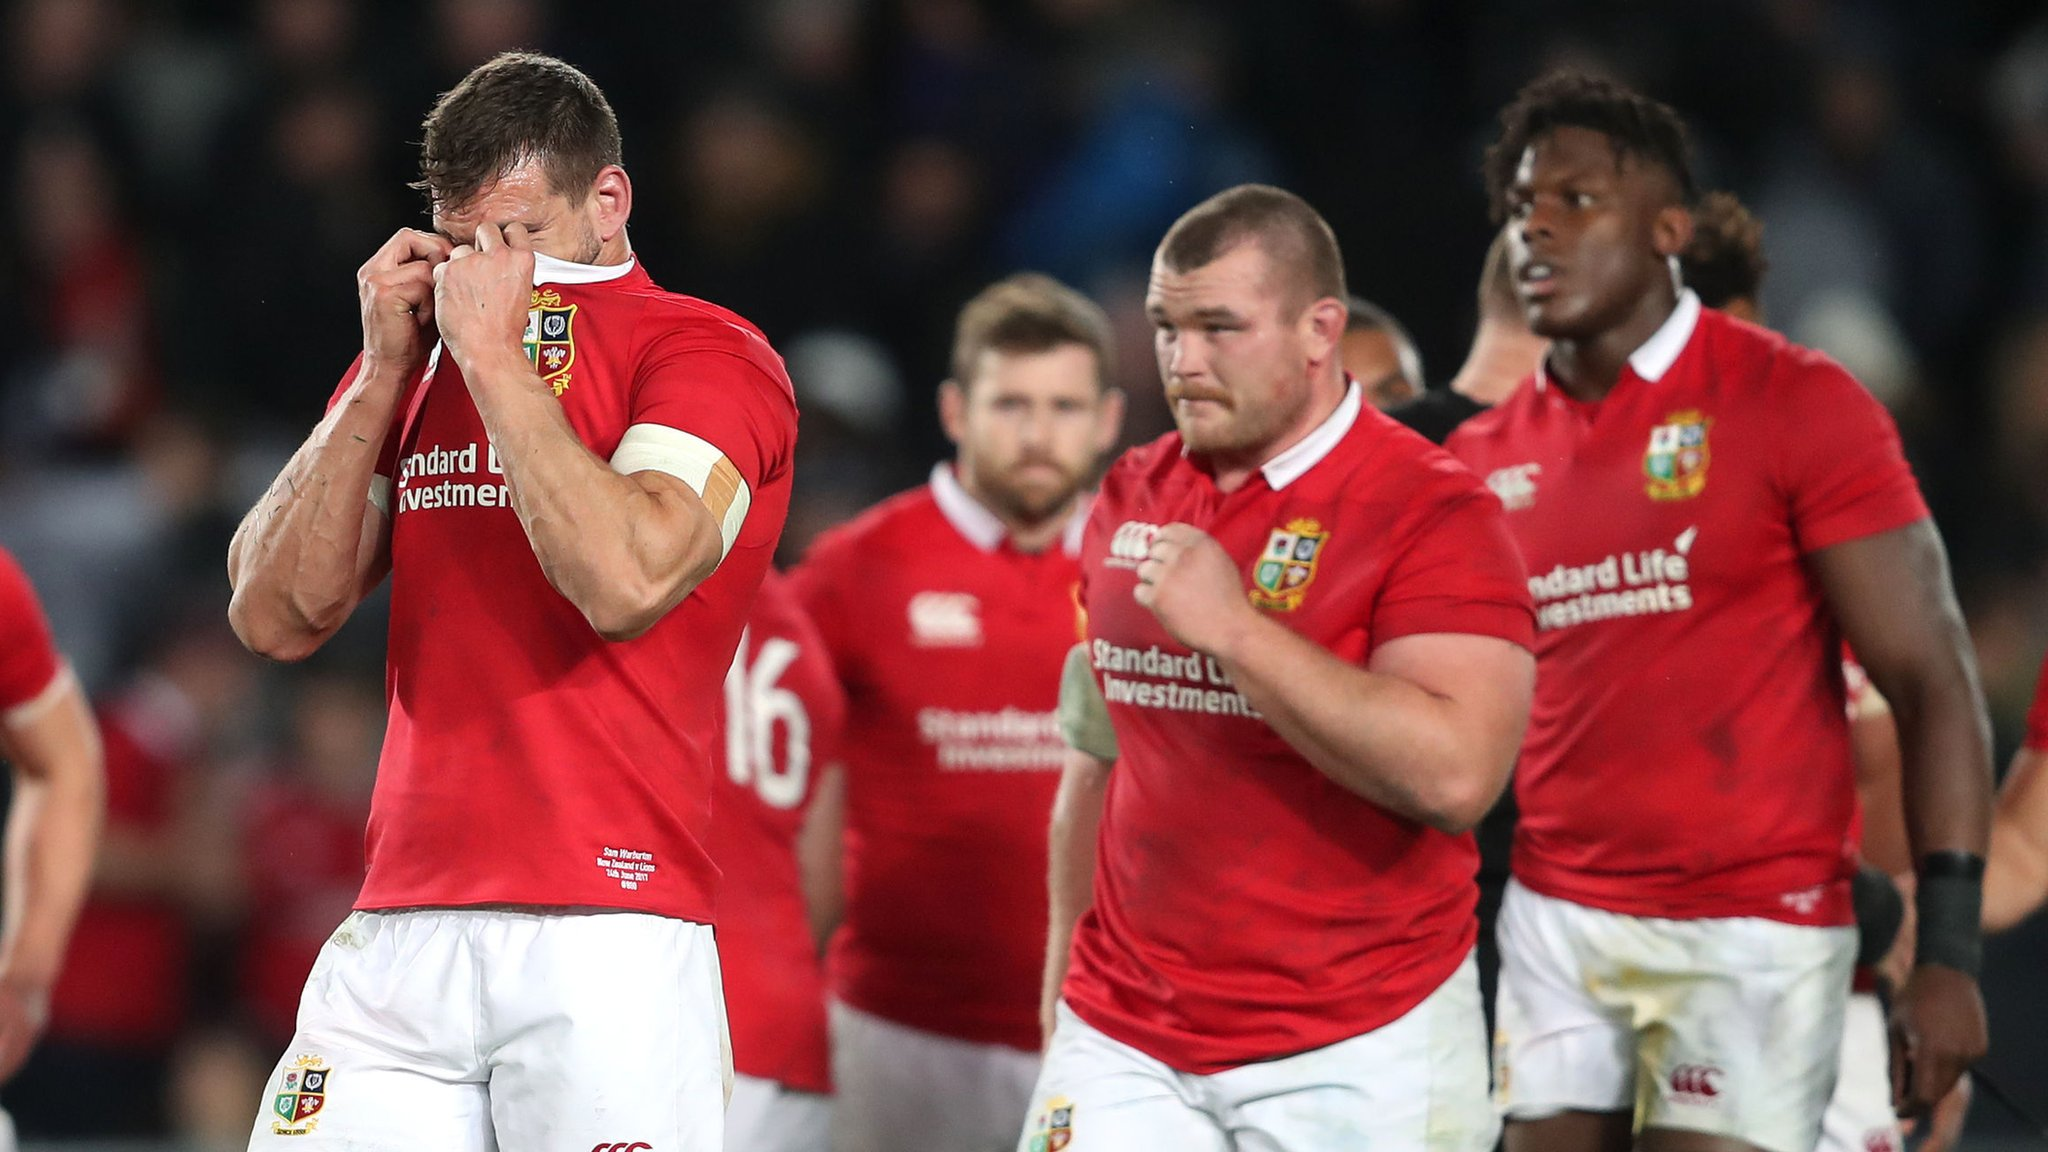 New Zealand outclass British and Irish Lions